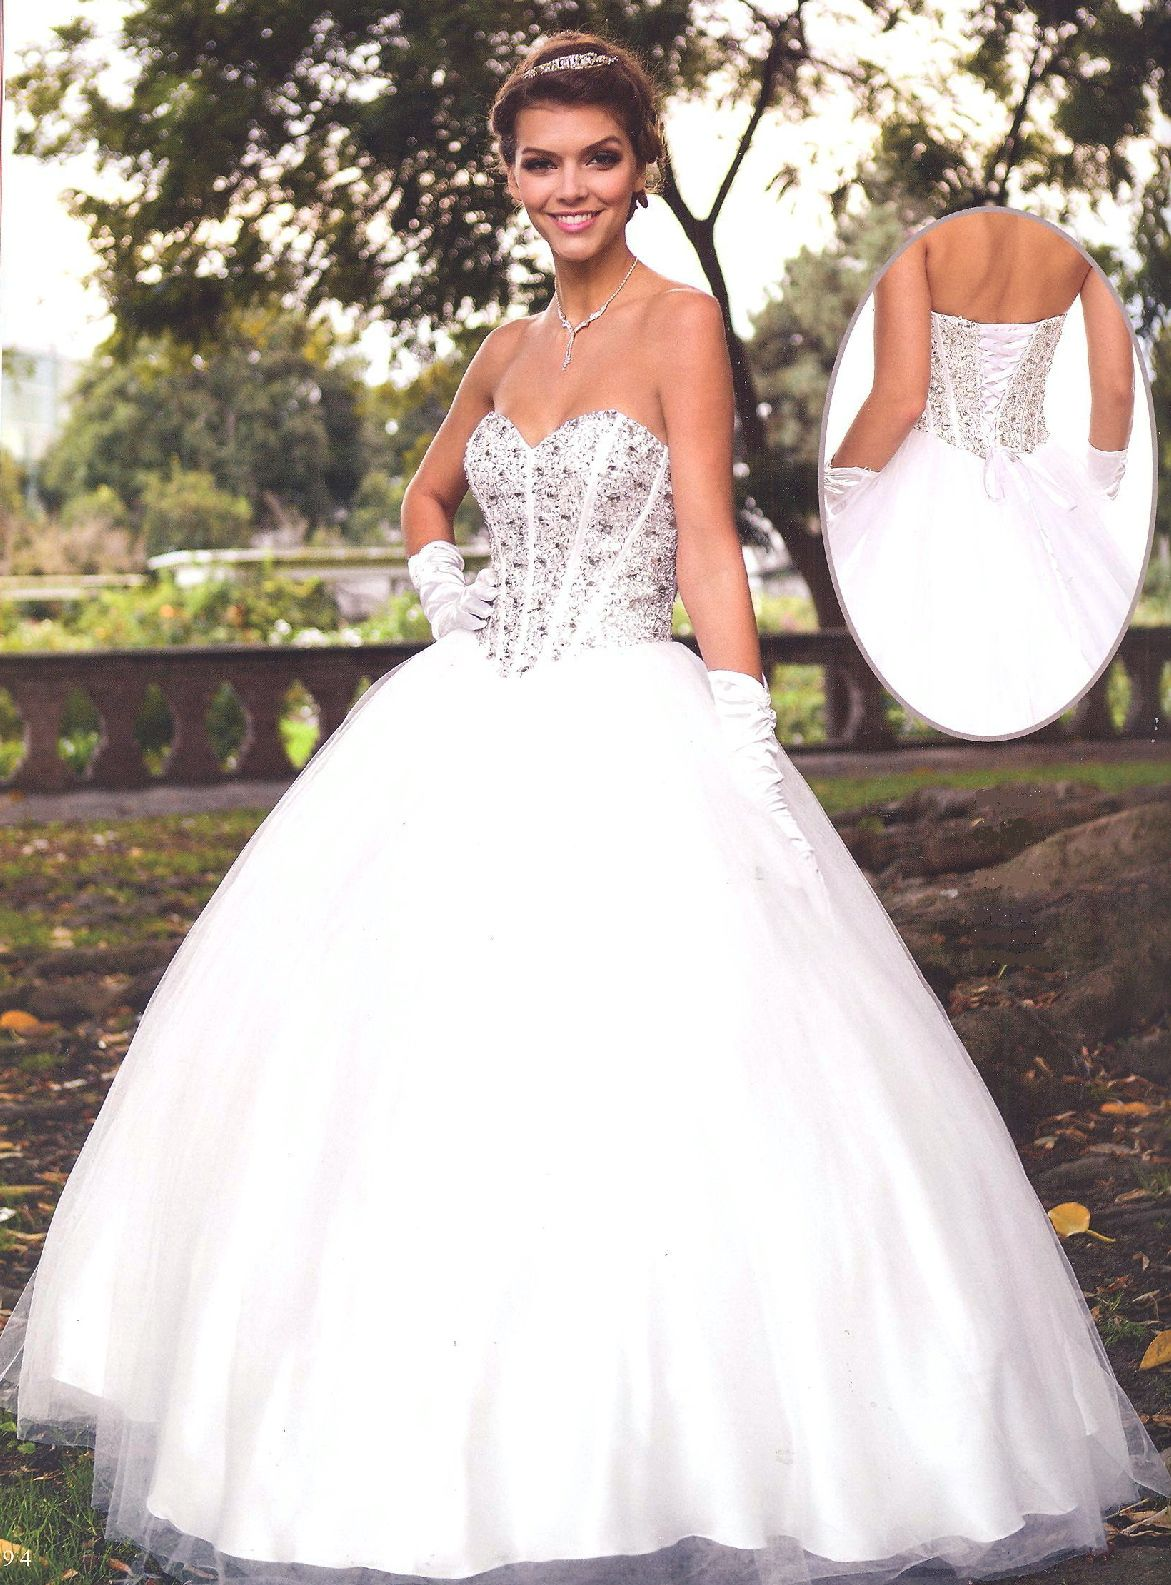 Wedding Dresses Cotillion DressesBR312BRSilver Rhinestone Bustier With Sweetheart